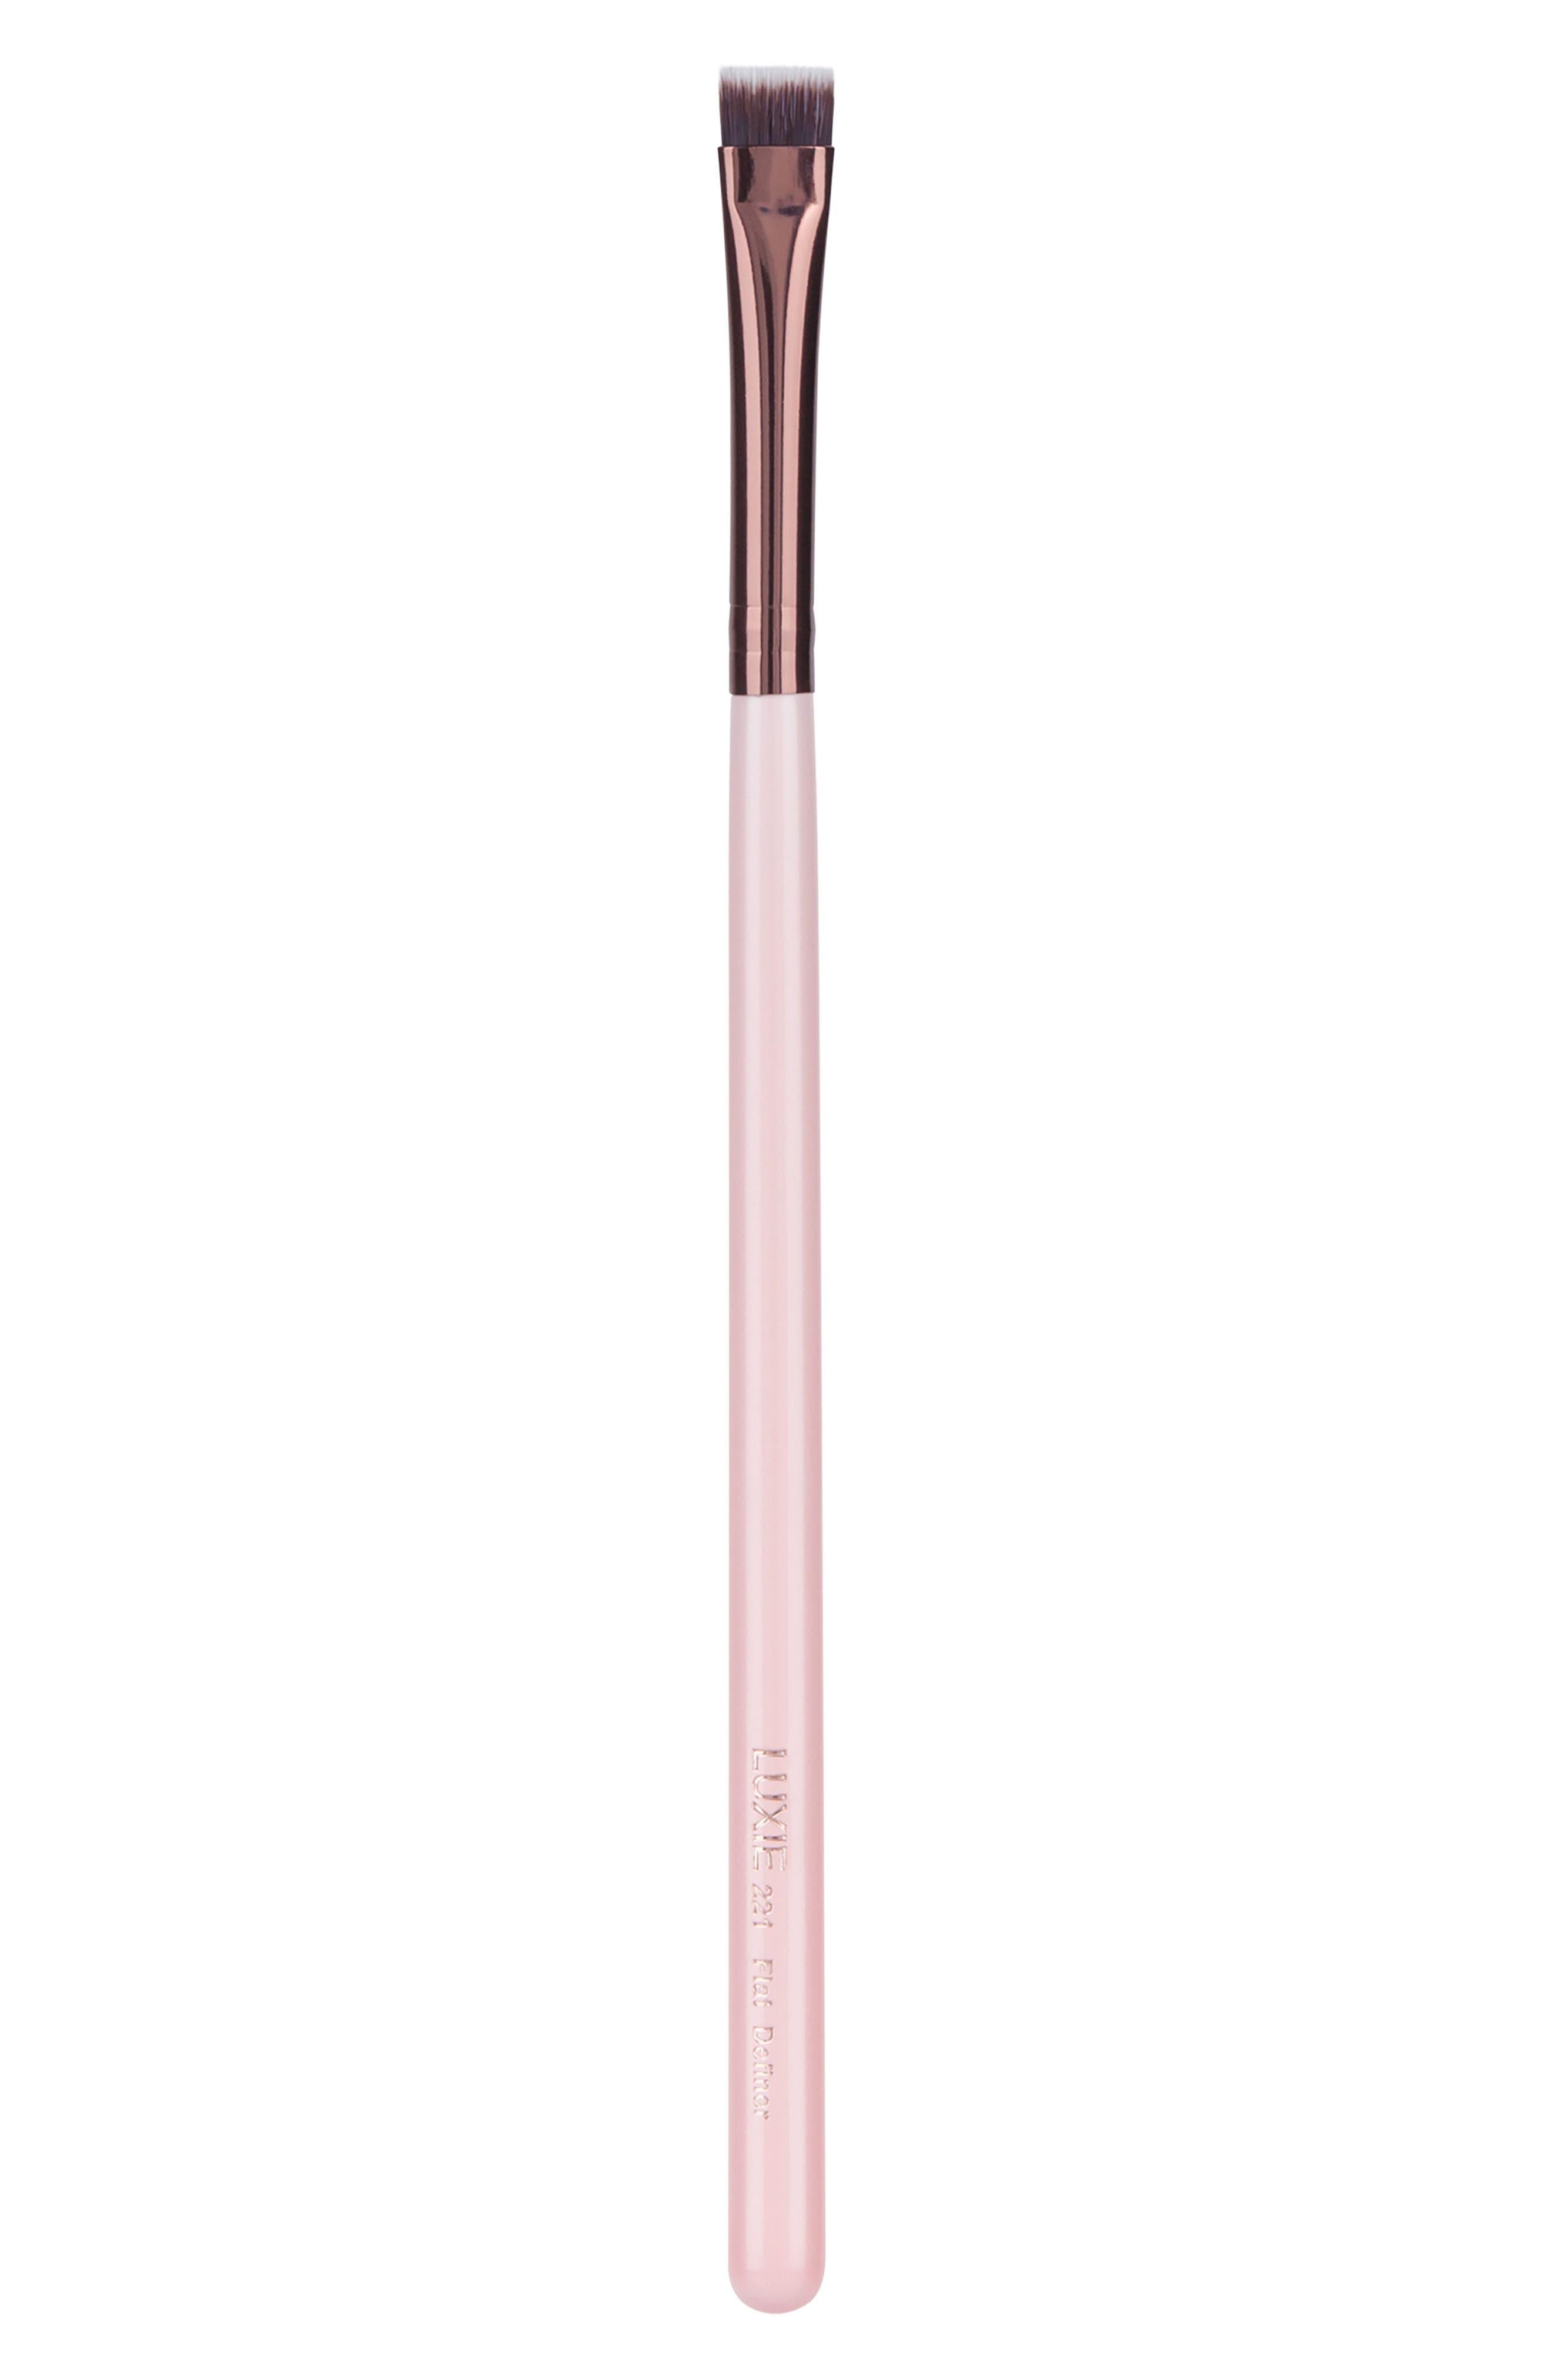 221 Rose Gold Flat Definer Brush,                             Main thumbnail 1, color,                             No Color